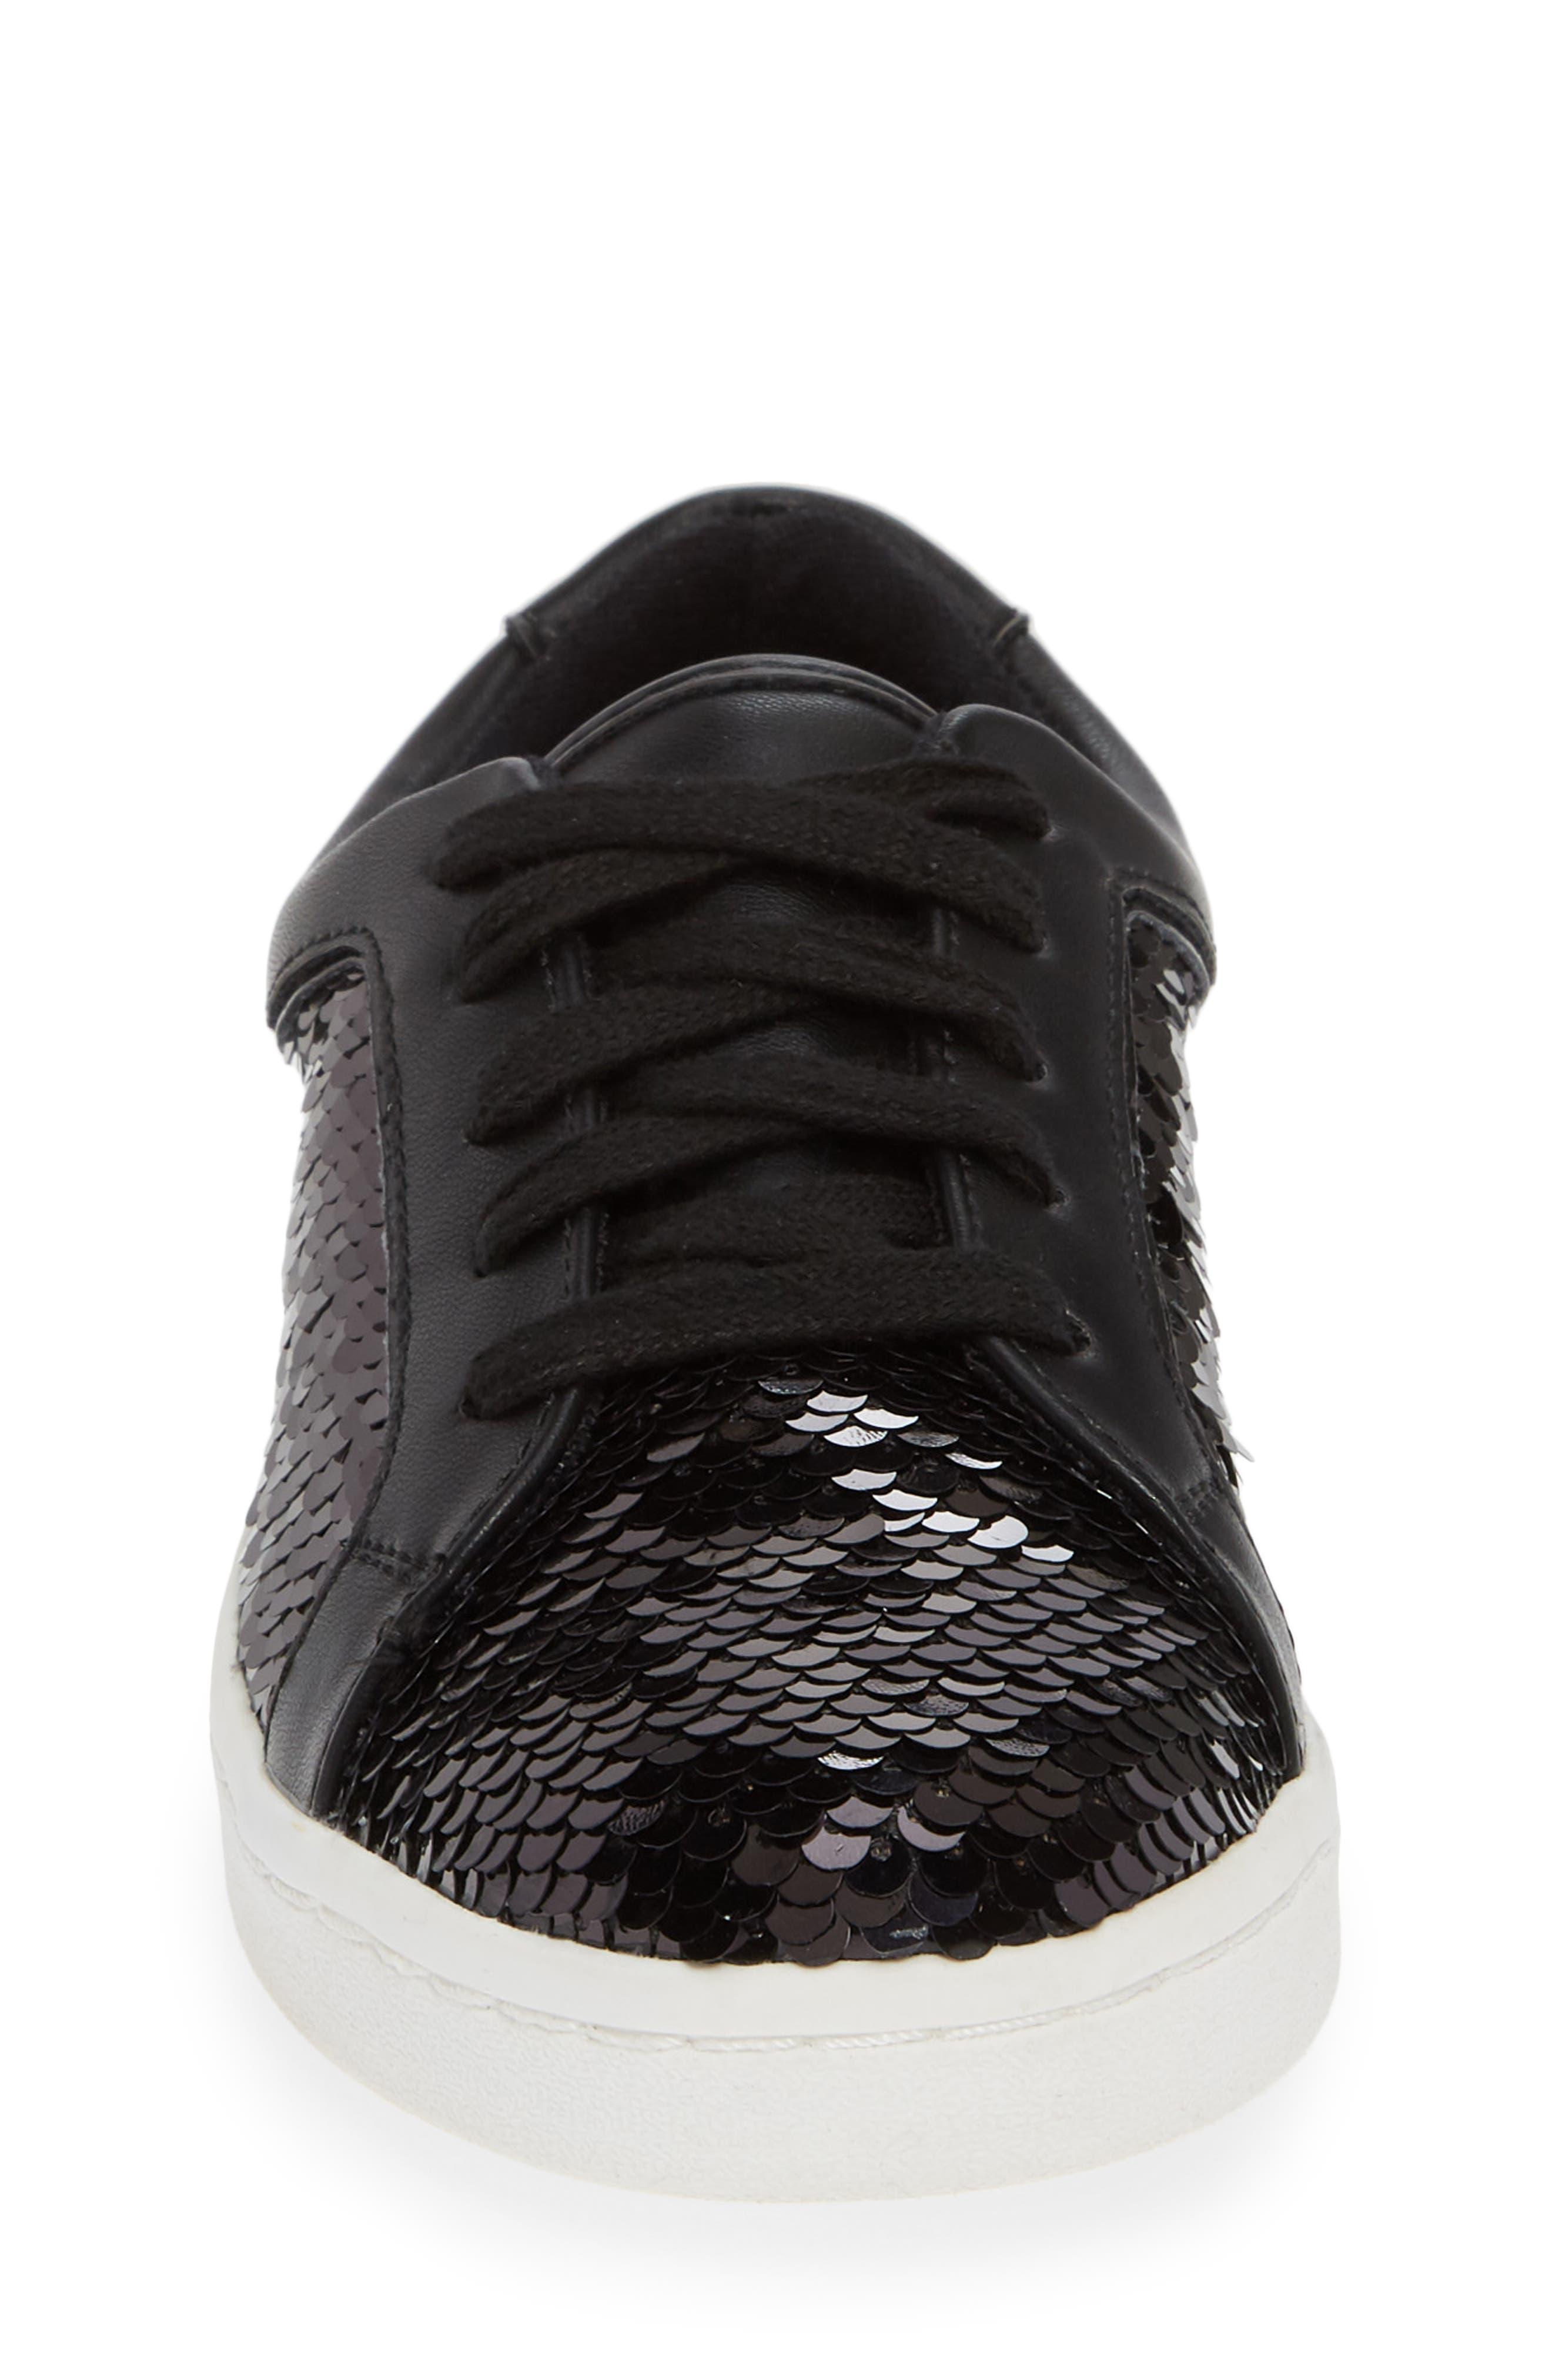 Blane Elizia Sequin Sneaker,                             Alternate thumbnail 4, color,                             BLACK SILVER